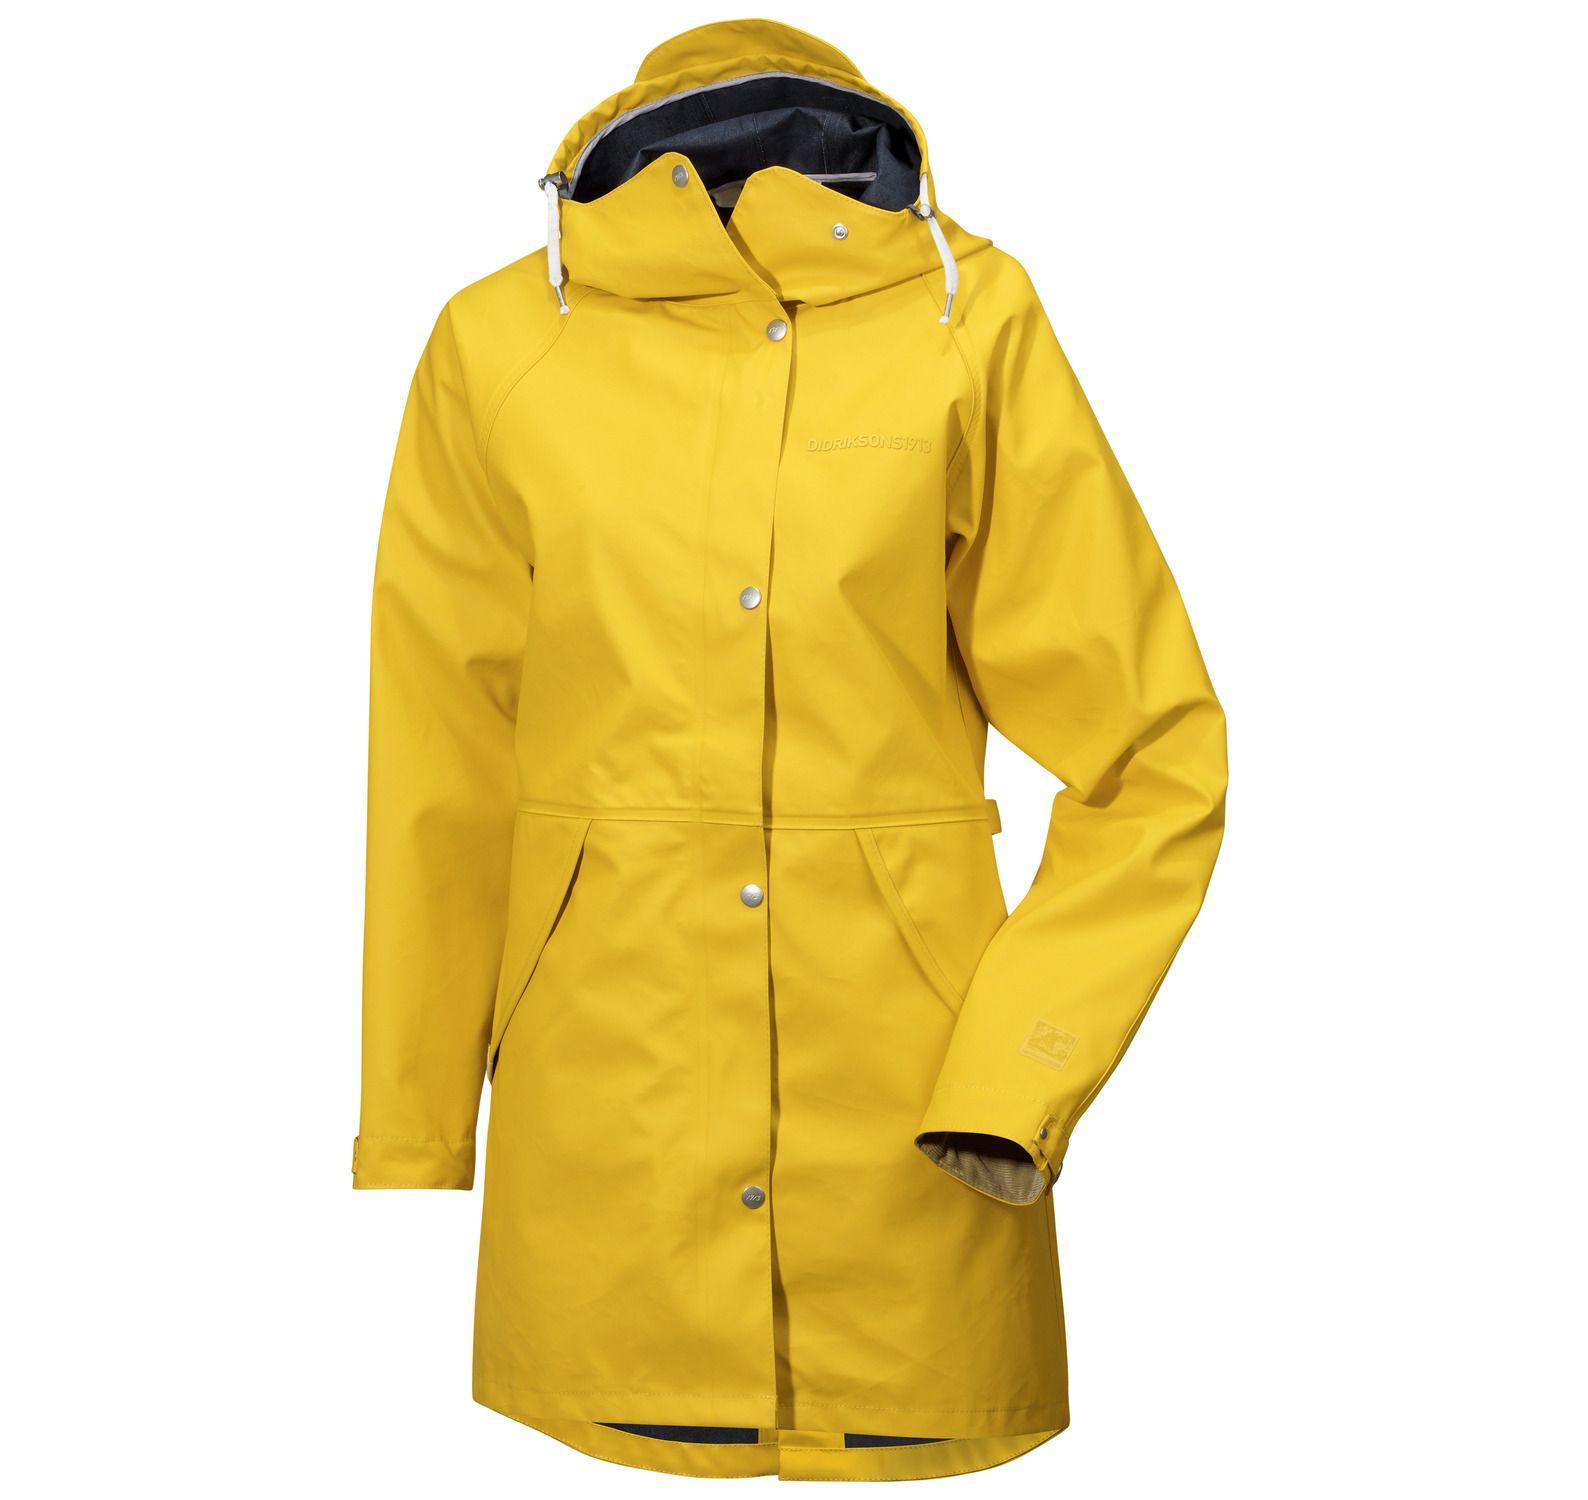 Hedvig Wns Coat, Yellow, 34, Didriksons Regnkläder